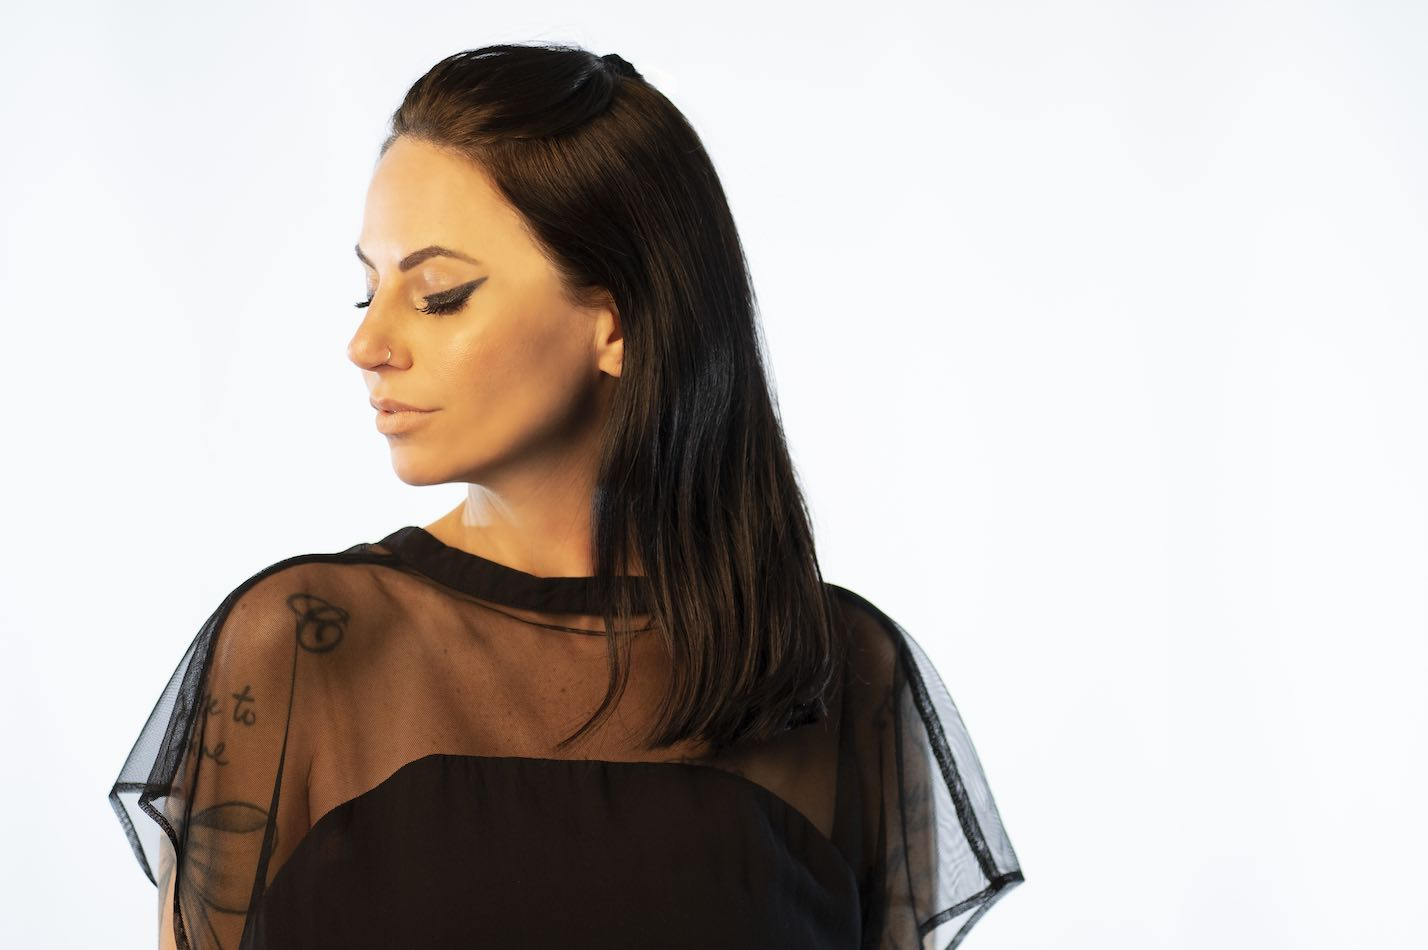 Mulheres artistas na cena da música eletrônica: Camila Vargas camila vargas, camilo rocha, dance music, John Digweed, live categral, mary olivetti, mulheres na música